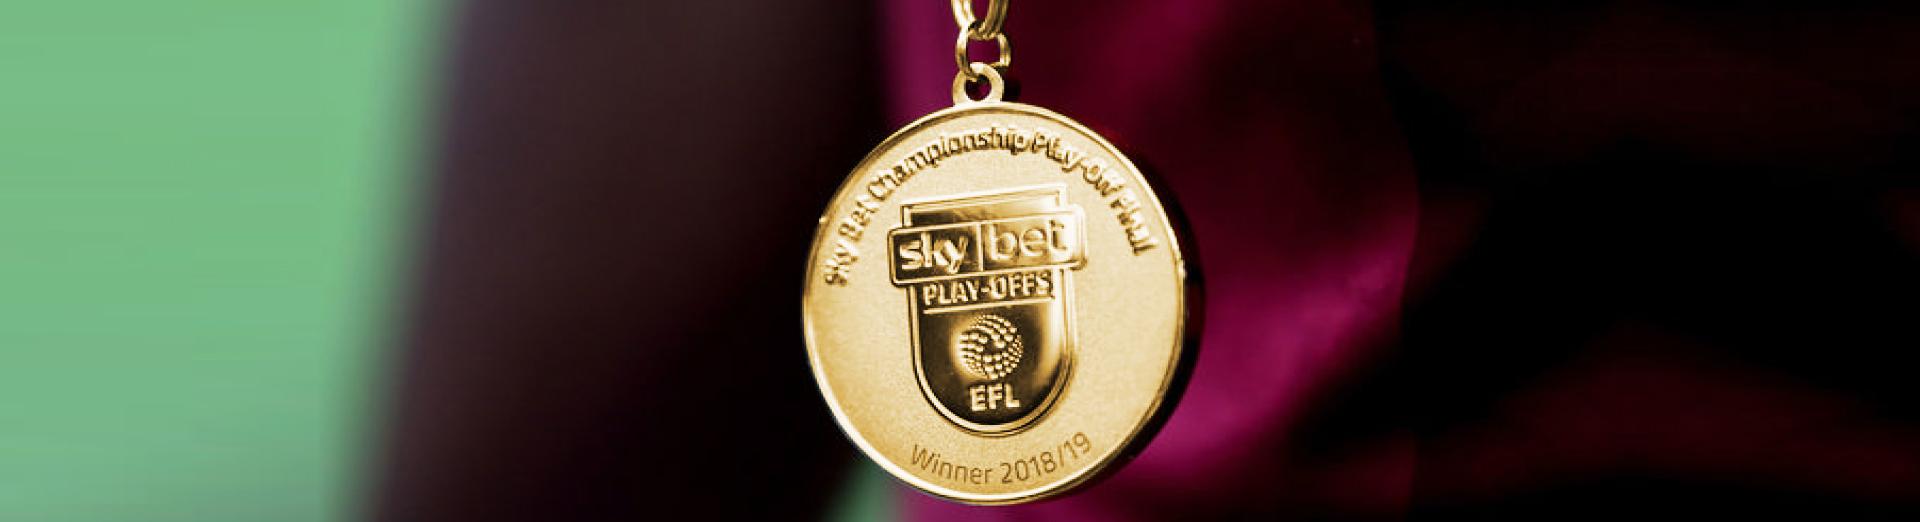 Sky Bet EFL Play-Offs